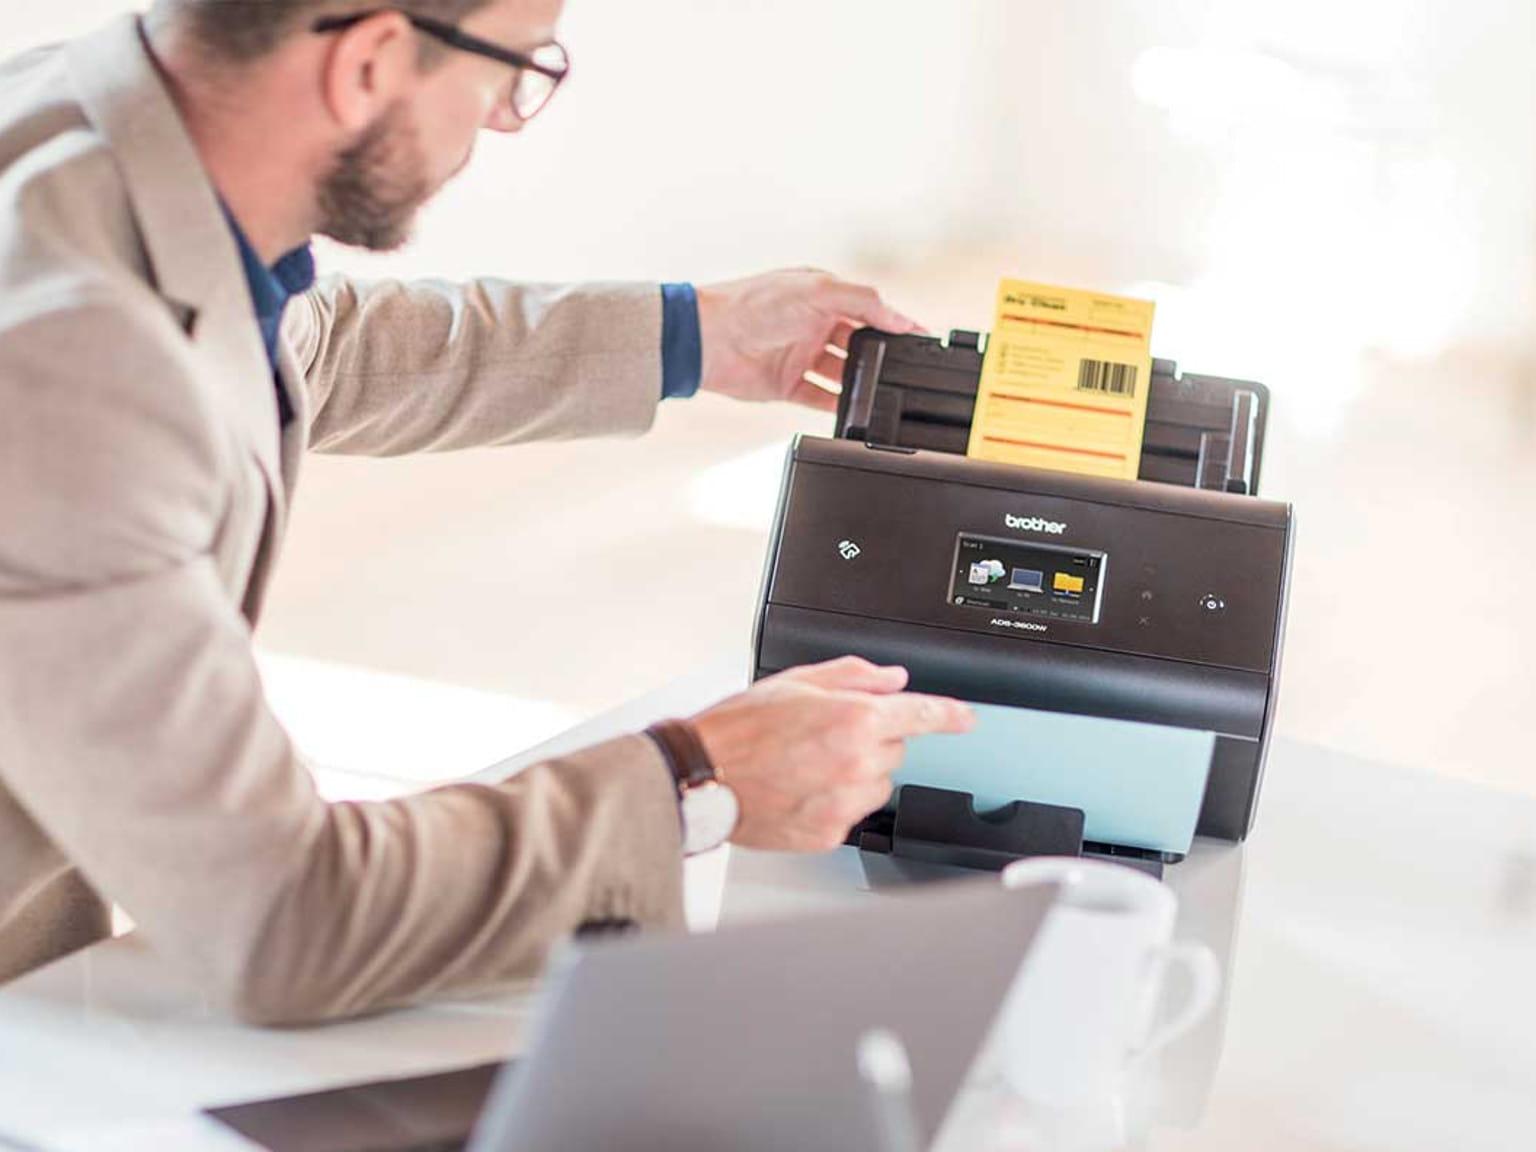 Escáner con Barcode Utility